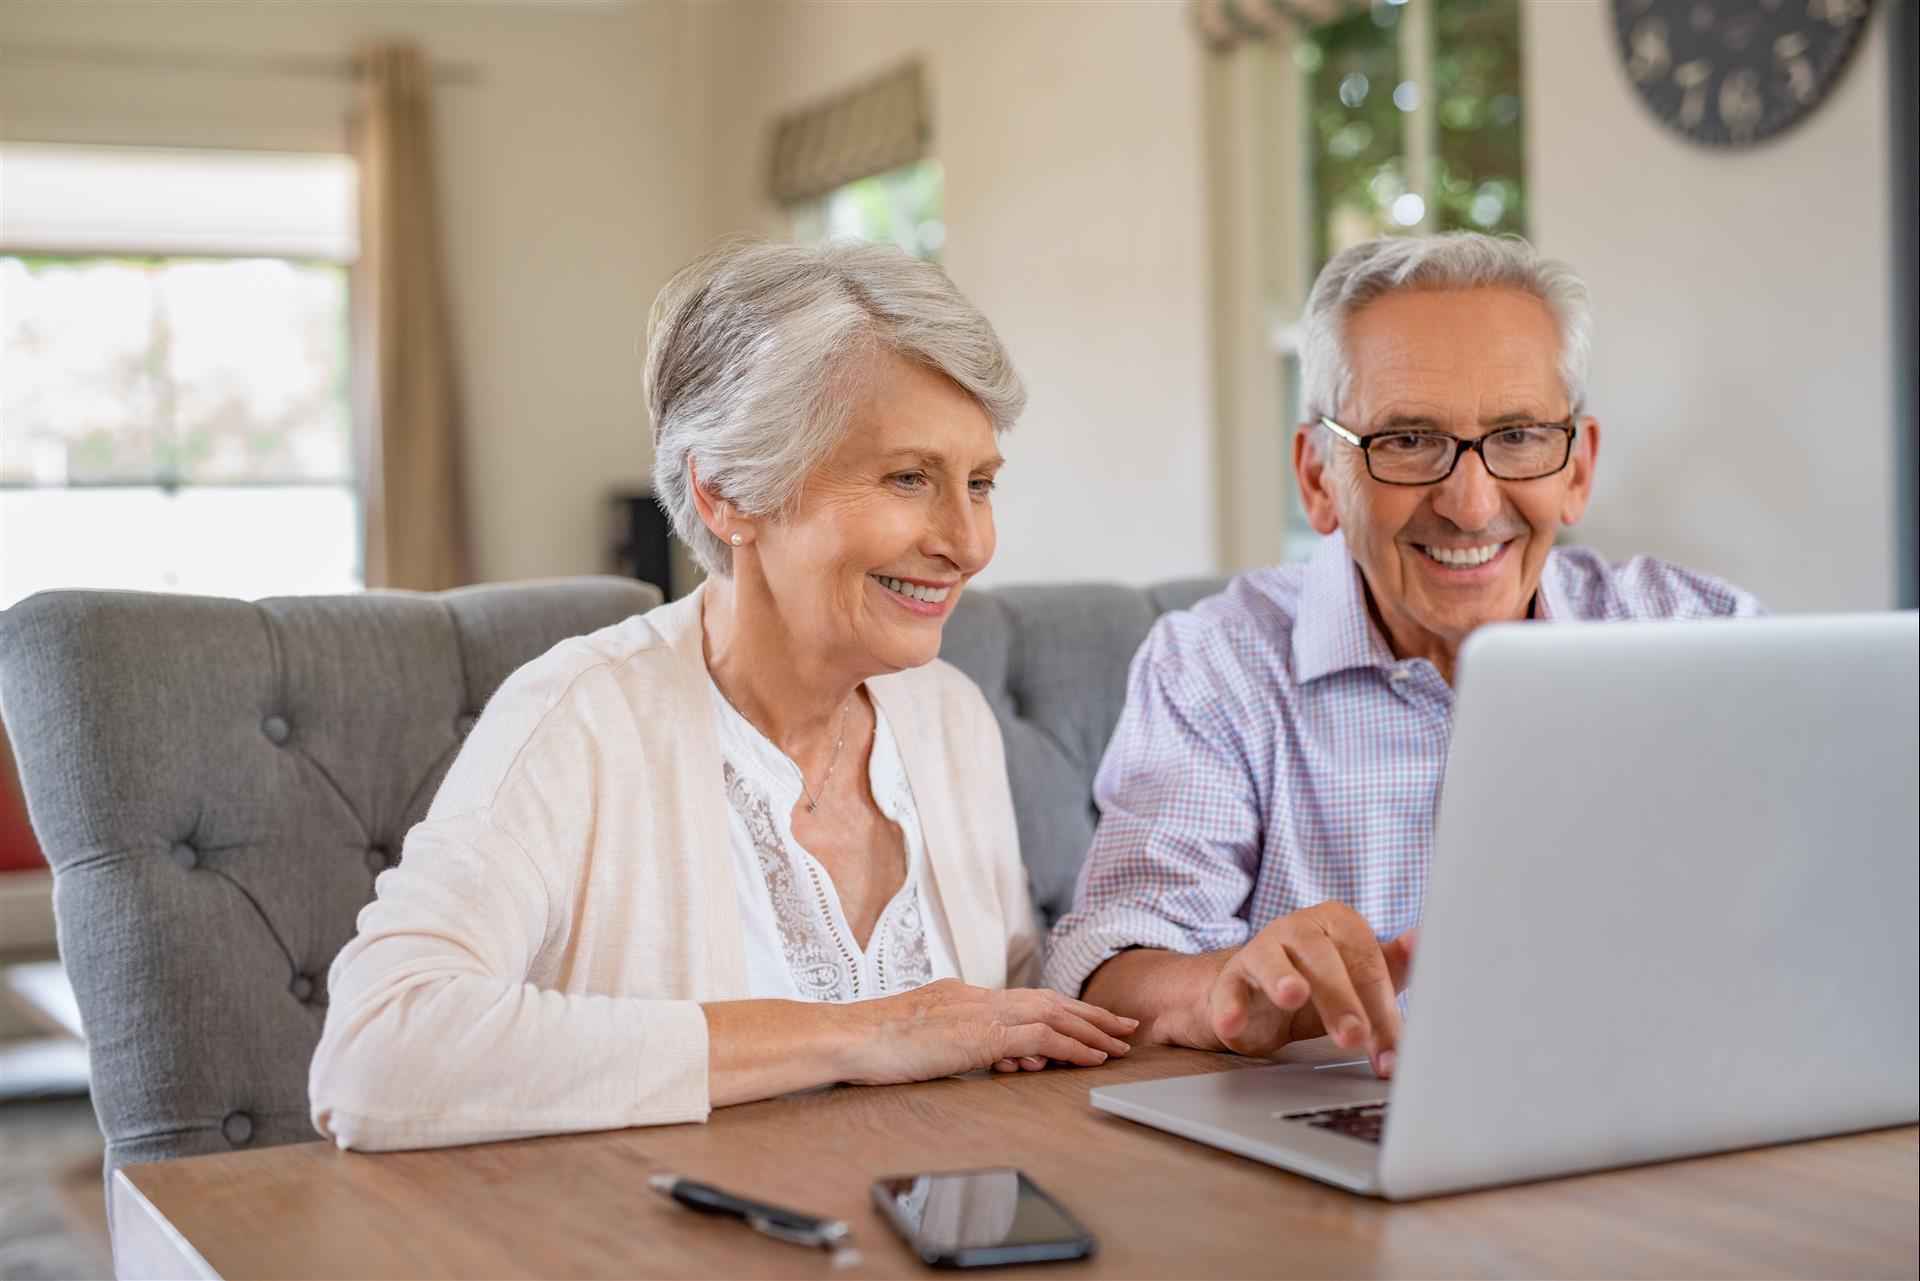 Best New Gadgets for Seniors